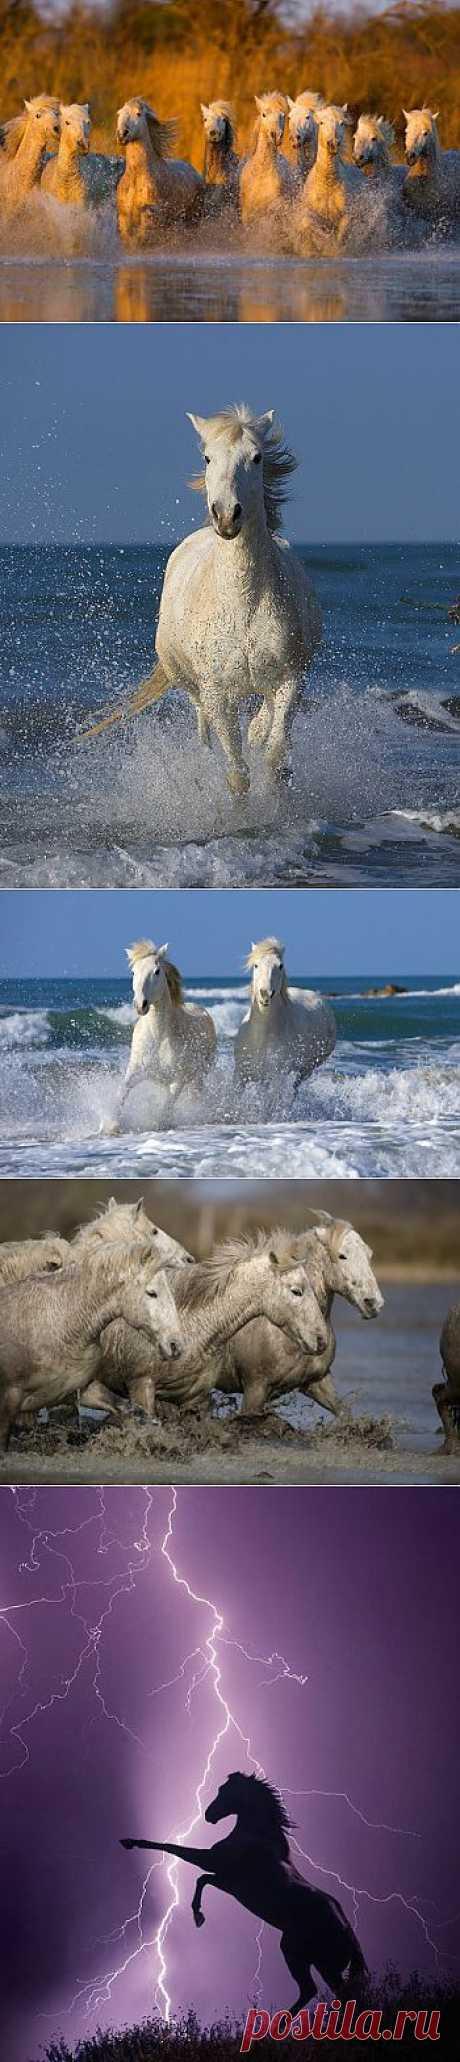 Лошади от Jim Zuckerman (7 красивых фотографий) » Зверушки.ру